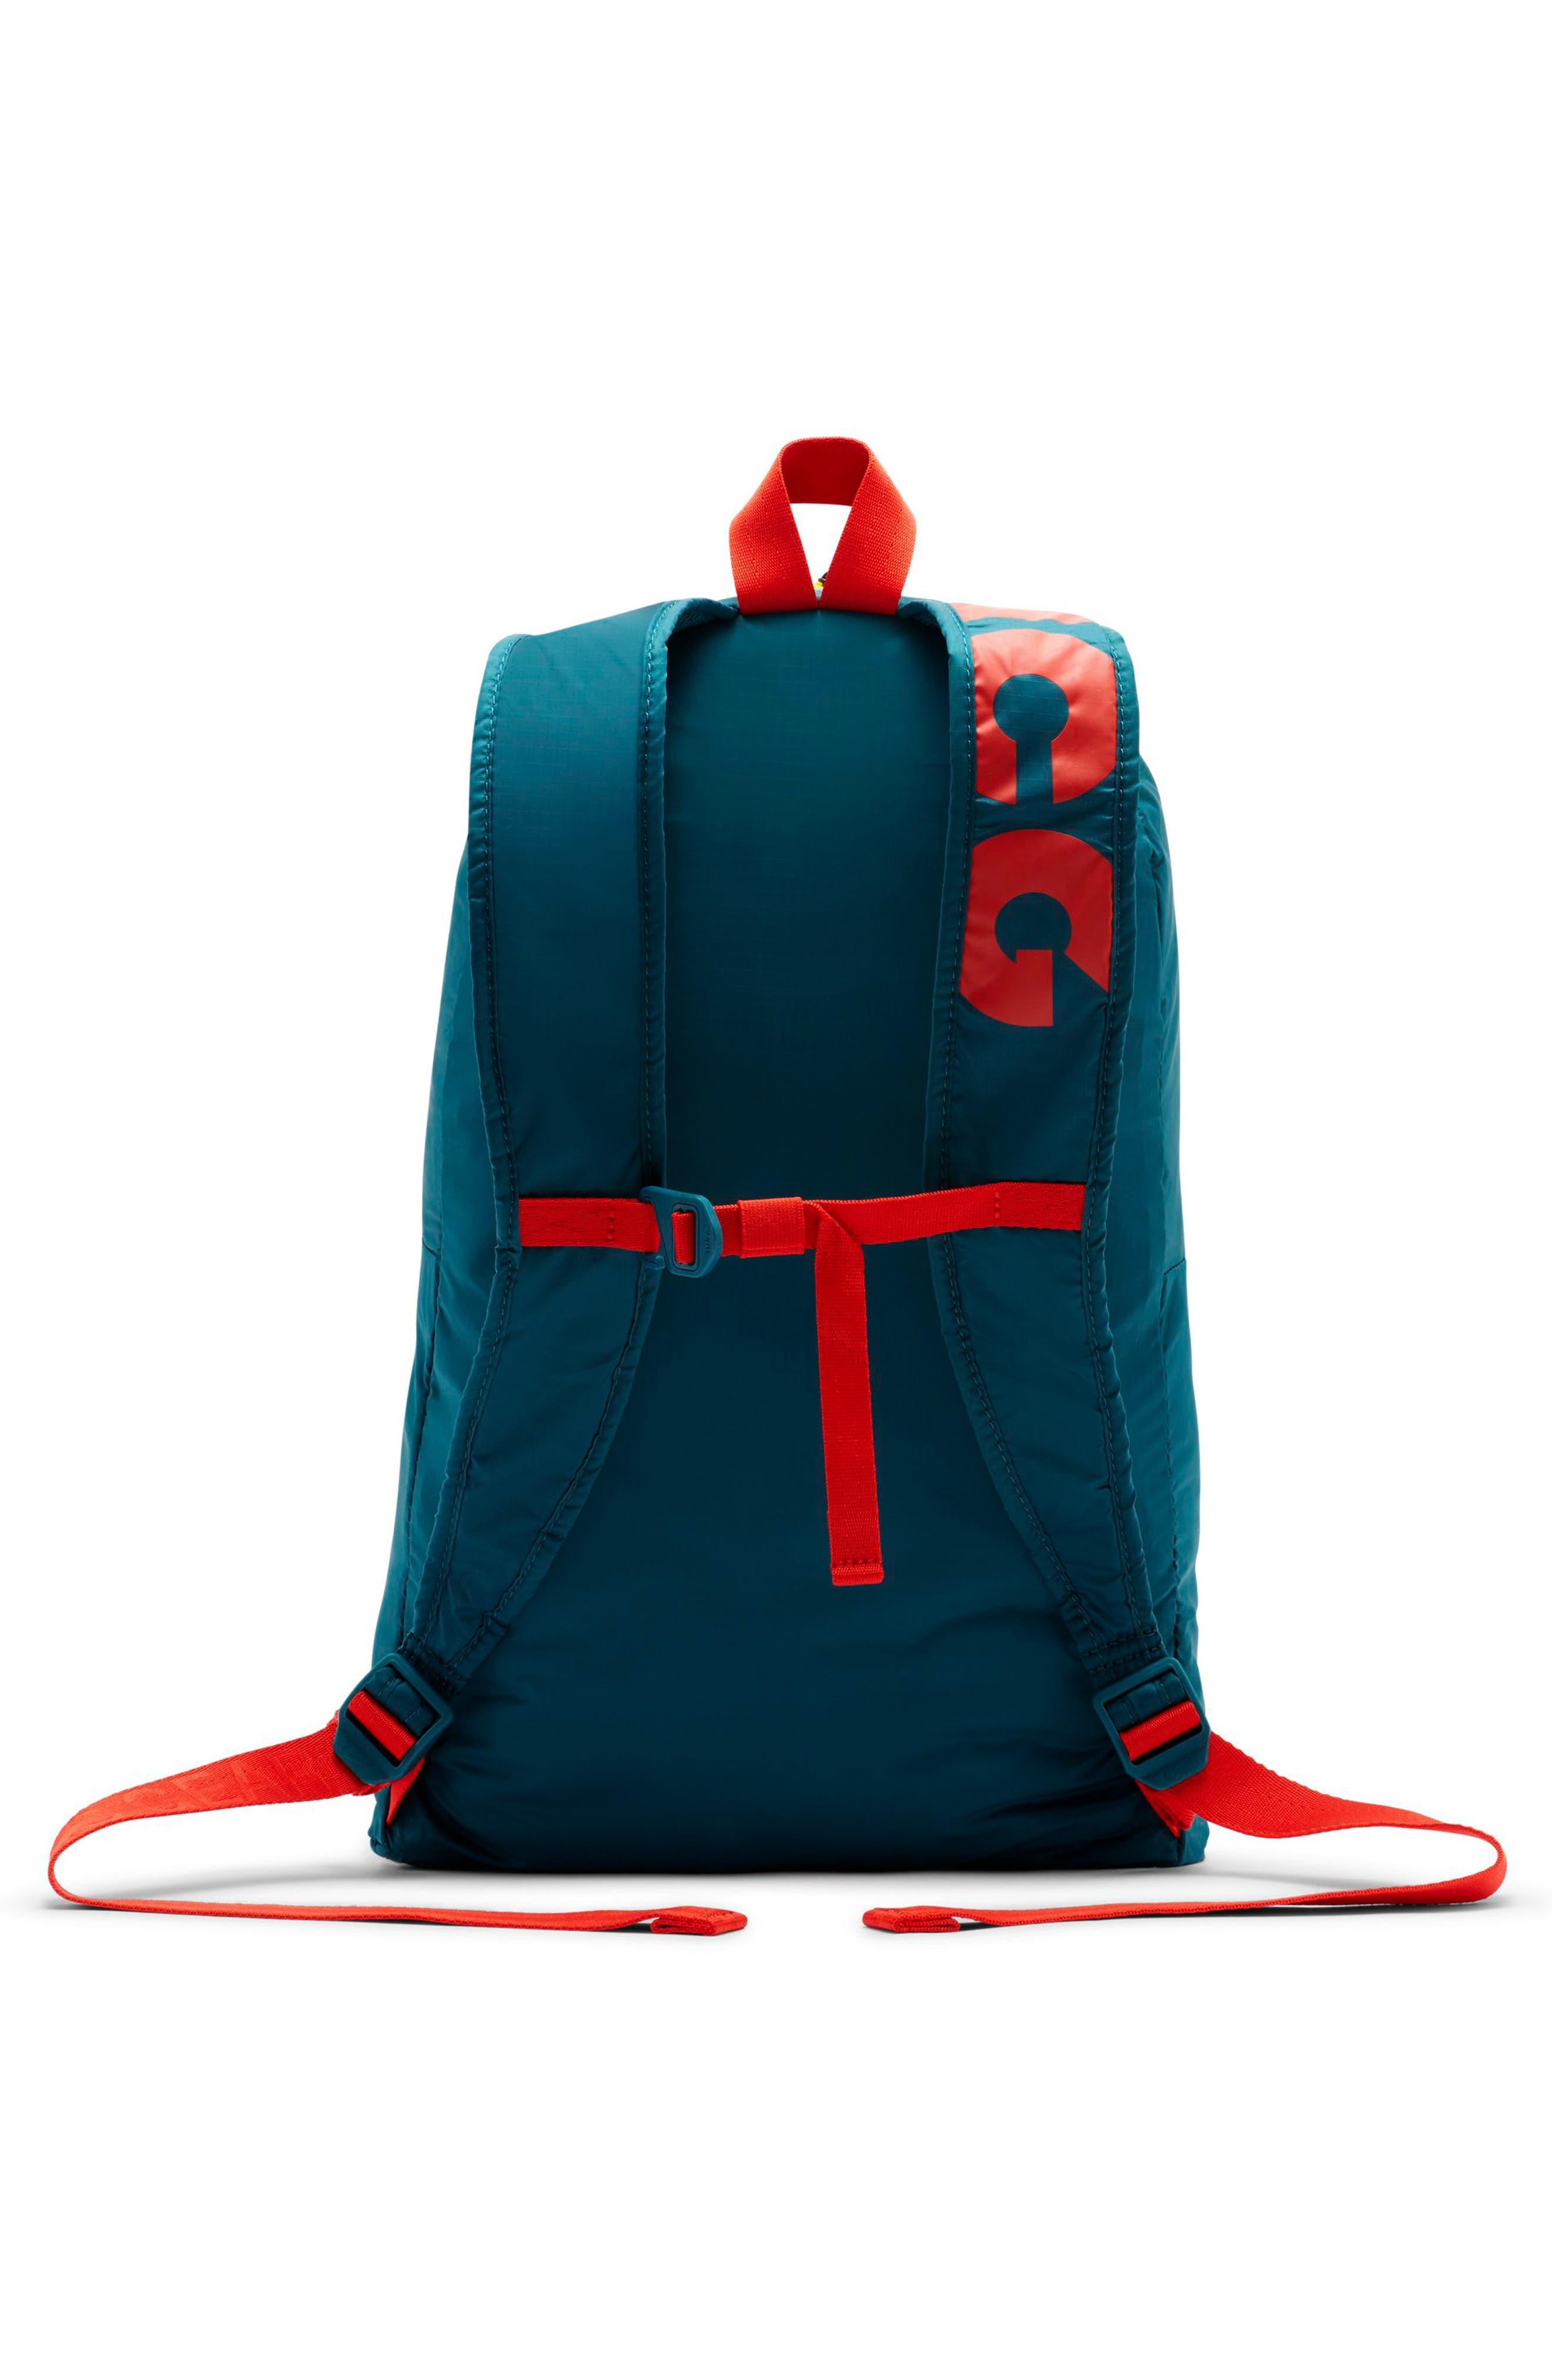 ACG Packable Backpack,                             Alternate thumbnail 2, color,                             GEODE TEAL/ GEODE TEAL